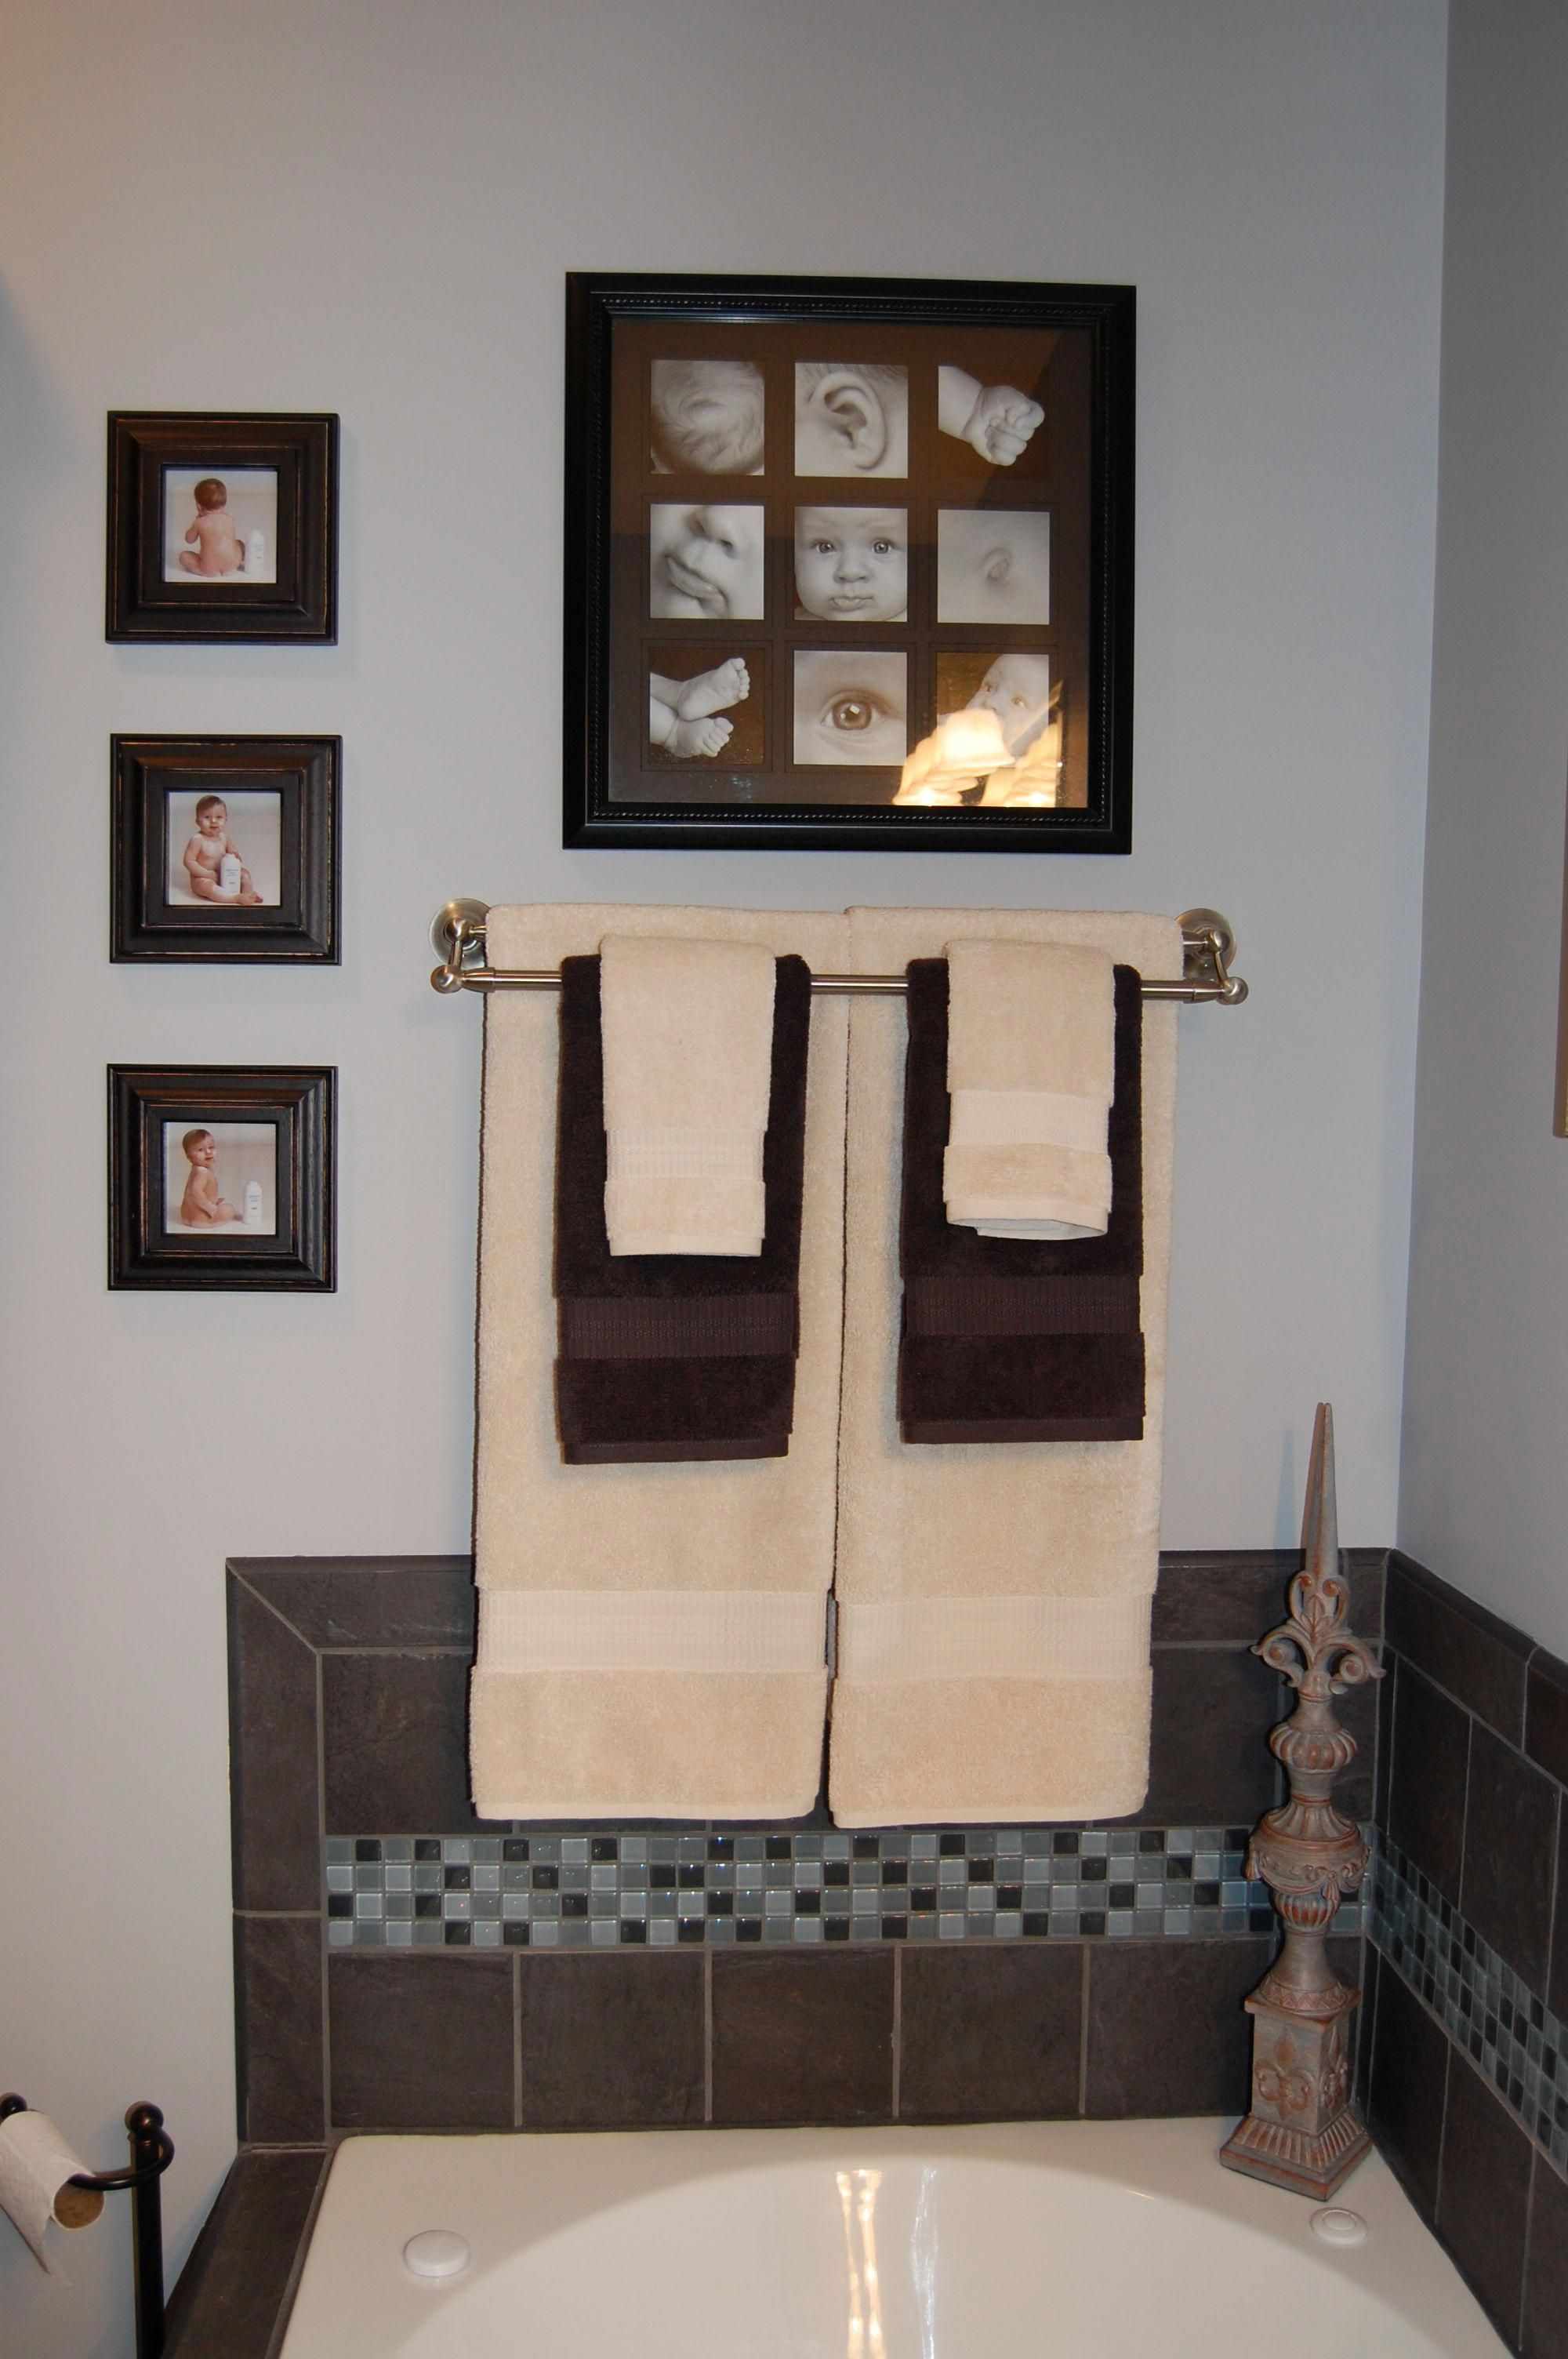 Brown Bathroom Decor Items Tealandbrownbathroomdecor Brown Bathroom Decor Brown Bathroom Bathroom Towel Decor